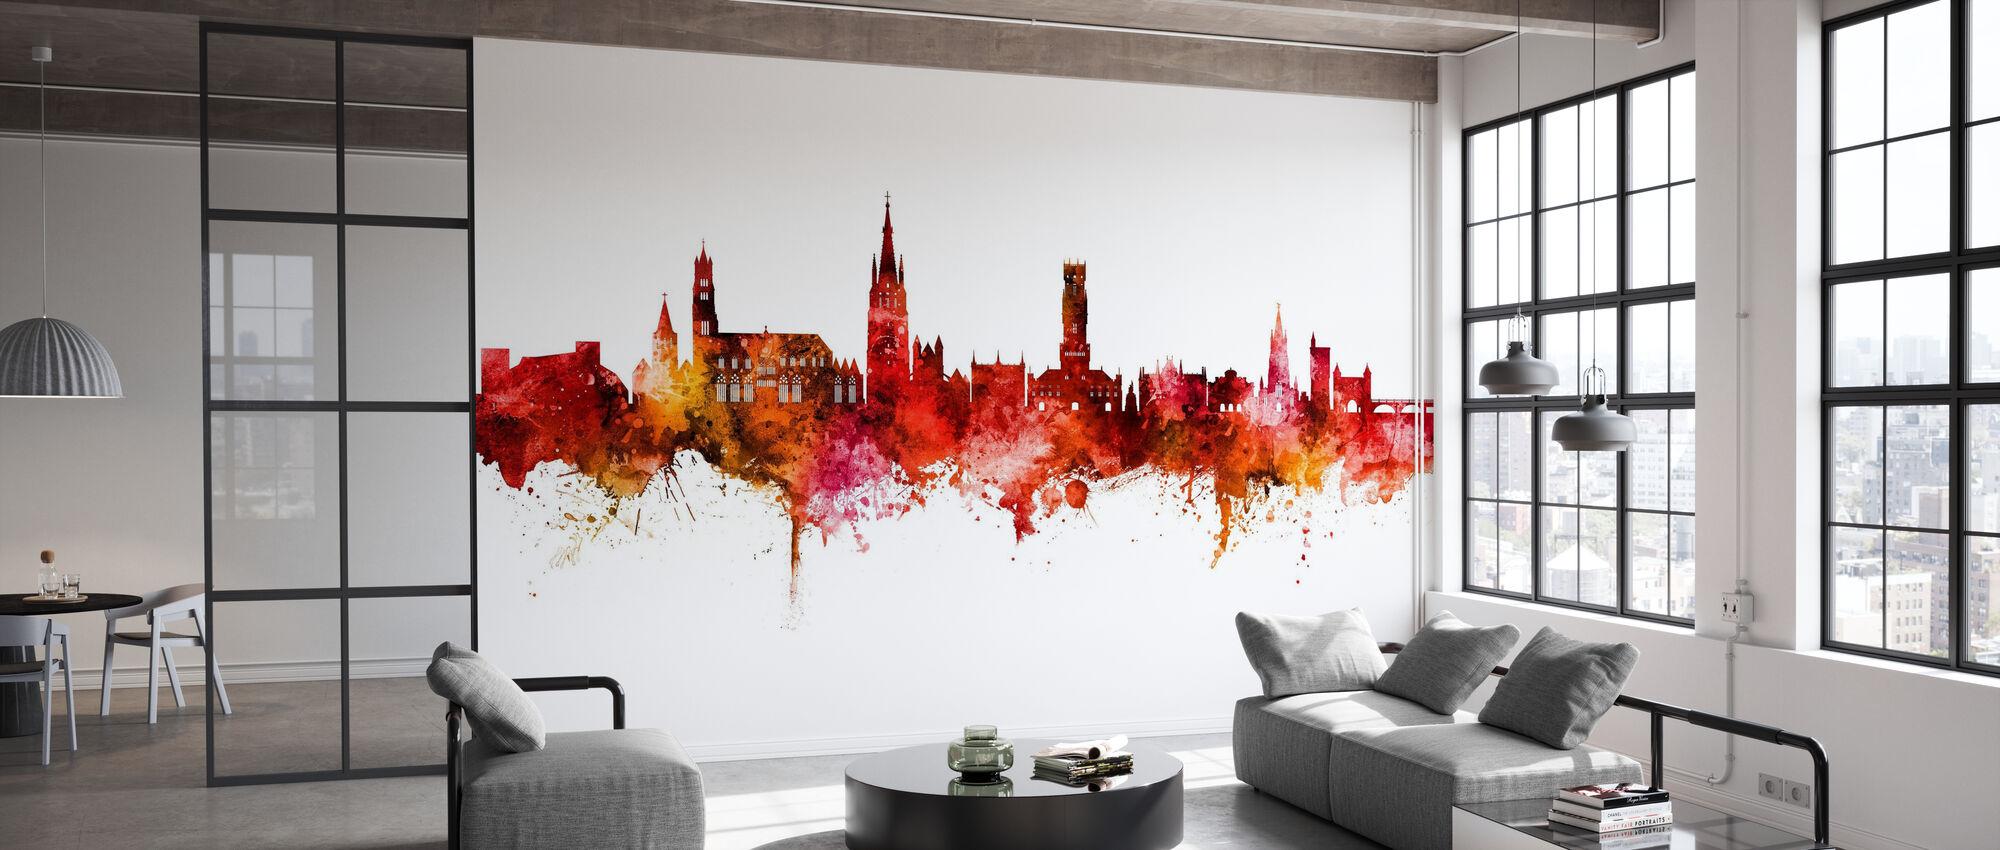 Bruges Belgium Skyline - Wallpaper - Office